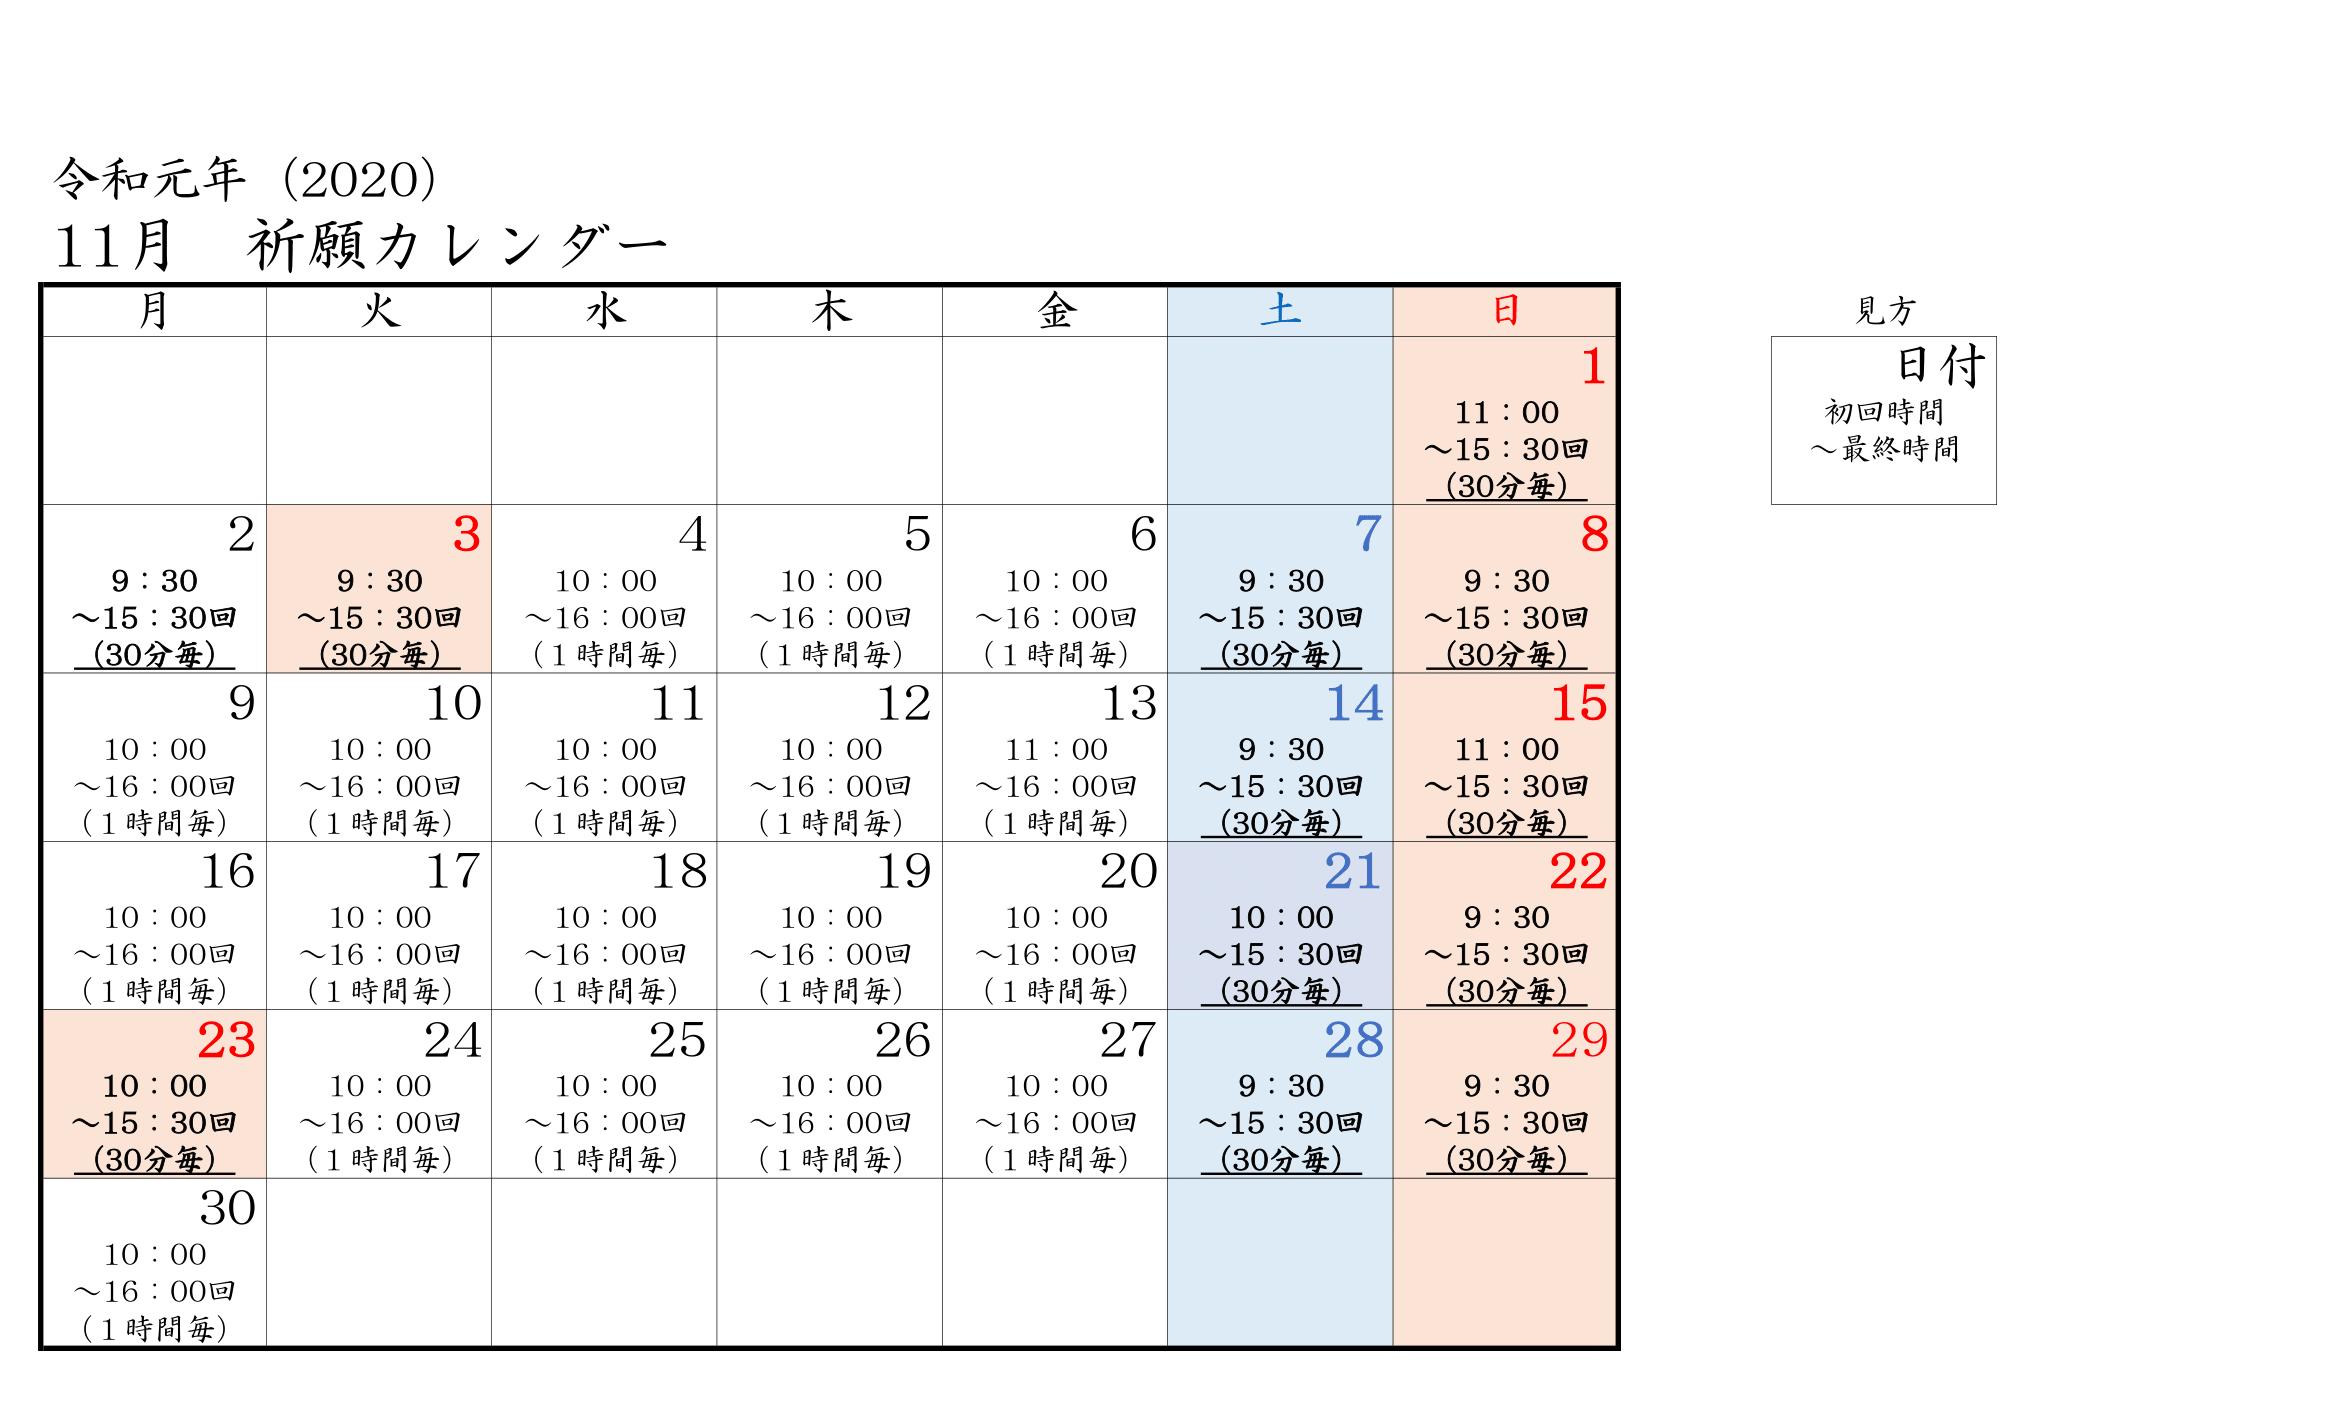 R2.11 七五三 予約カレンダー-1.png